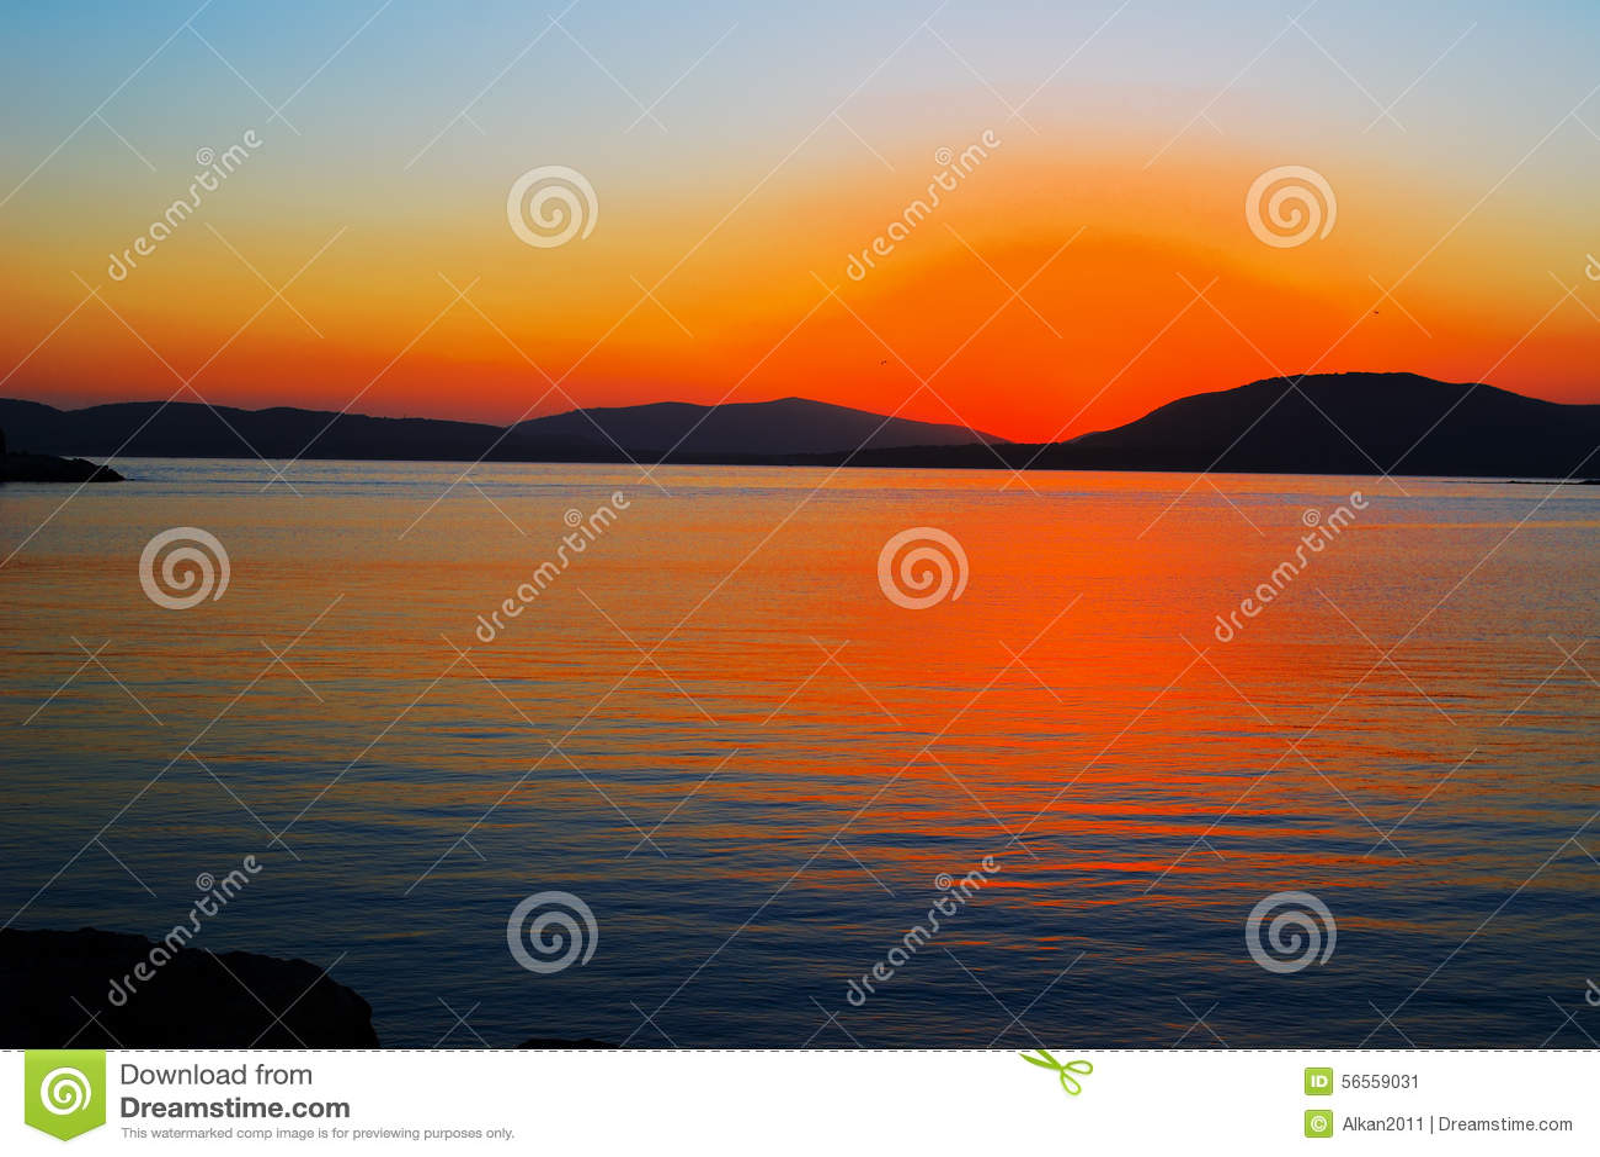 Download Πορτοκαλί ηλιοβασίλεμα σε Alghero μια σαφή ημέρα, Στοκ Εικόνα - εικόνα από dusk, μεσογειακός: 56559031